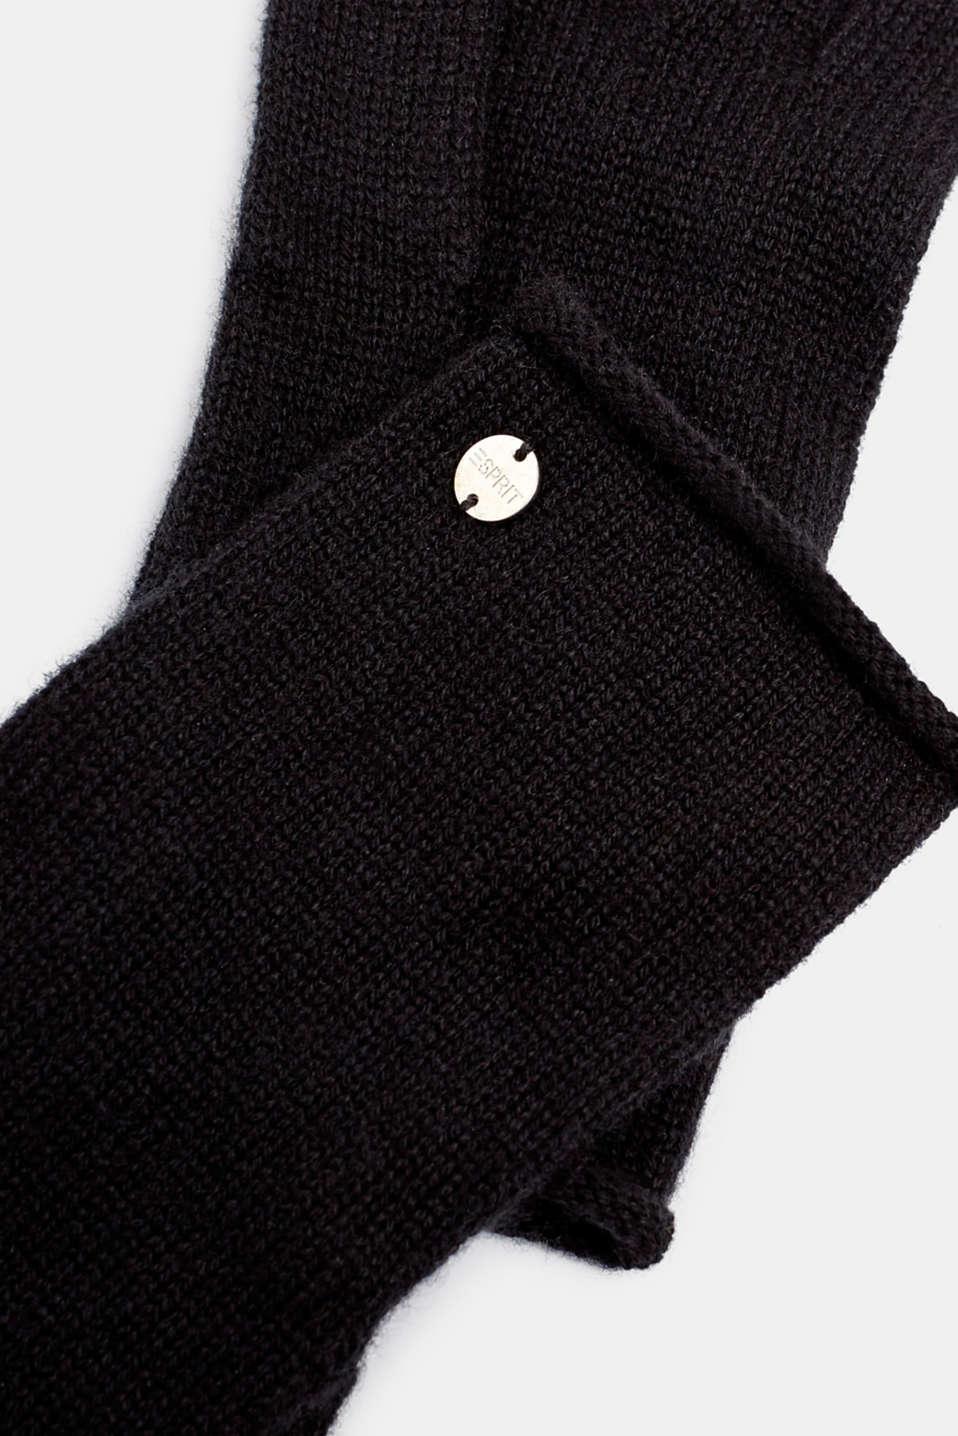 Knit gloves in a cashmere/wool blend, BLACK, detail image number 1